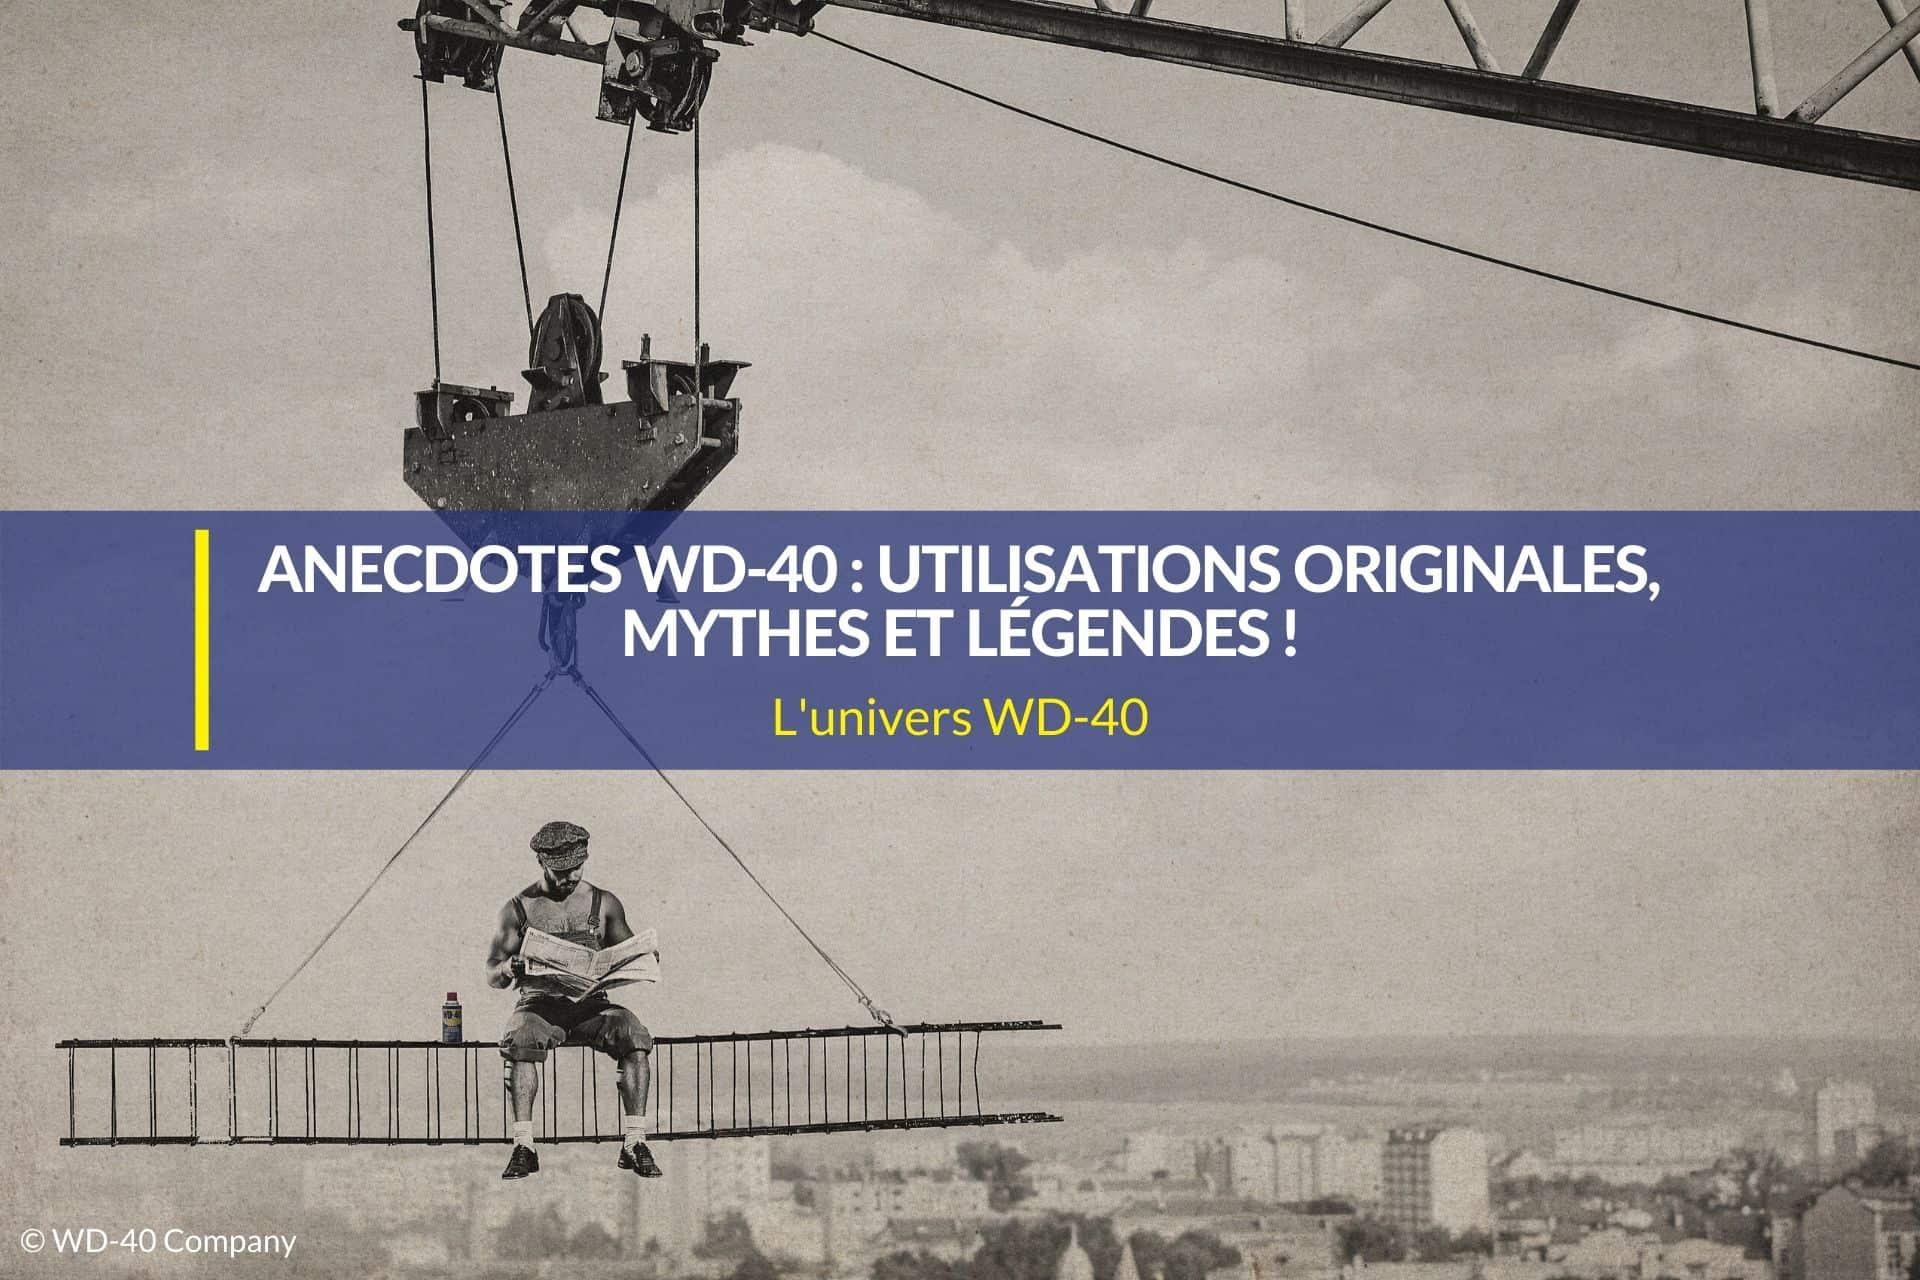 anecdotes wd 40